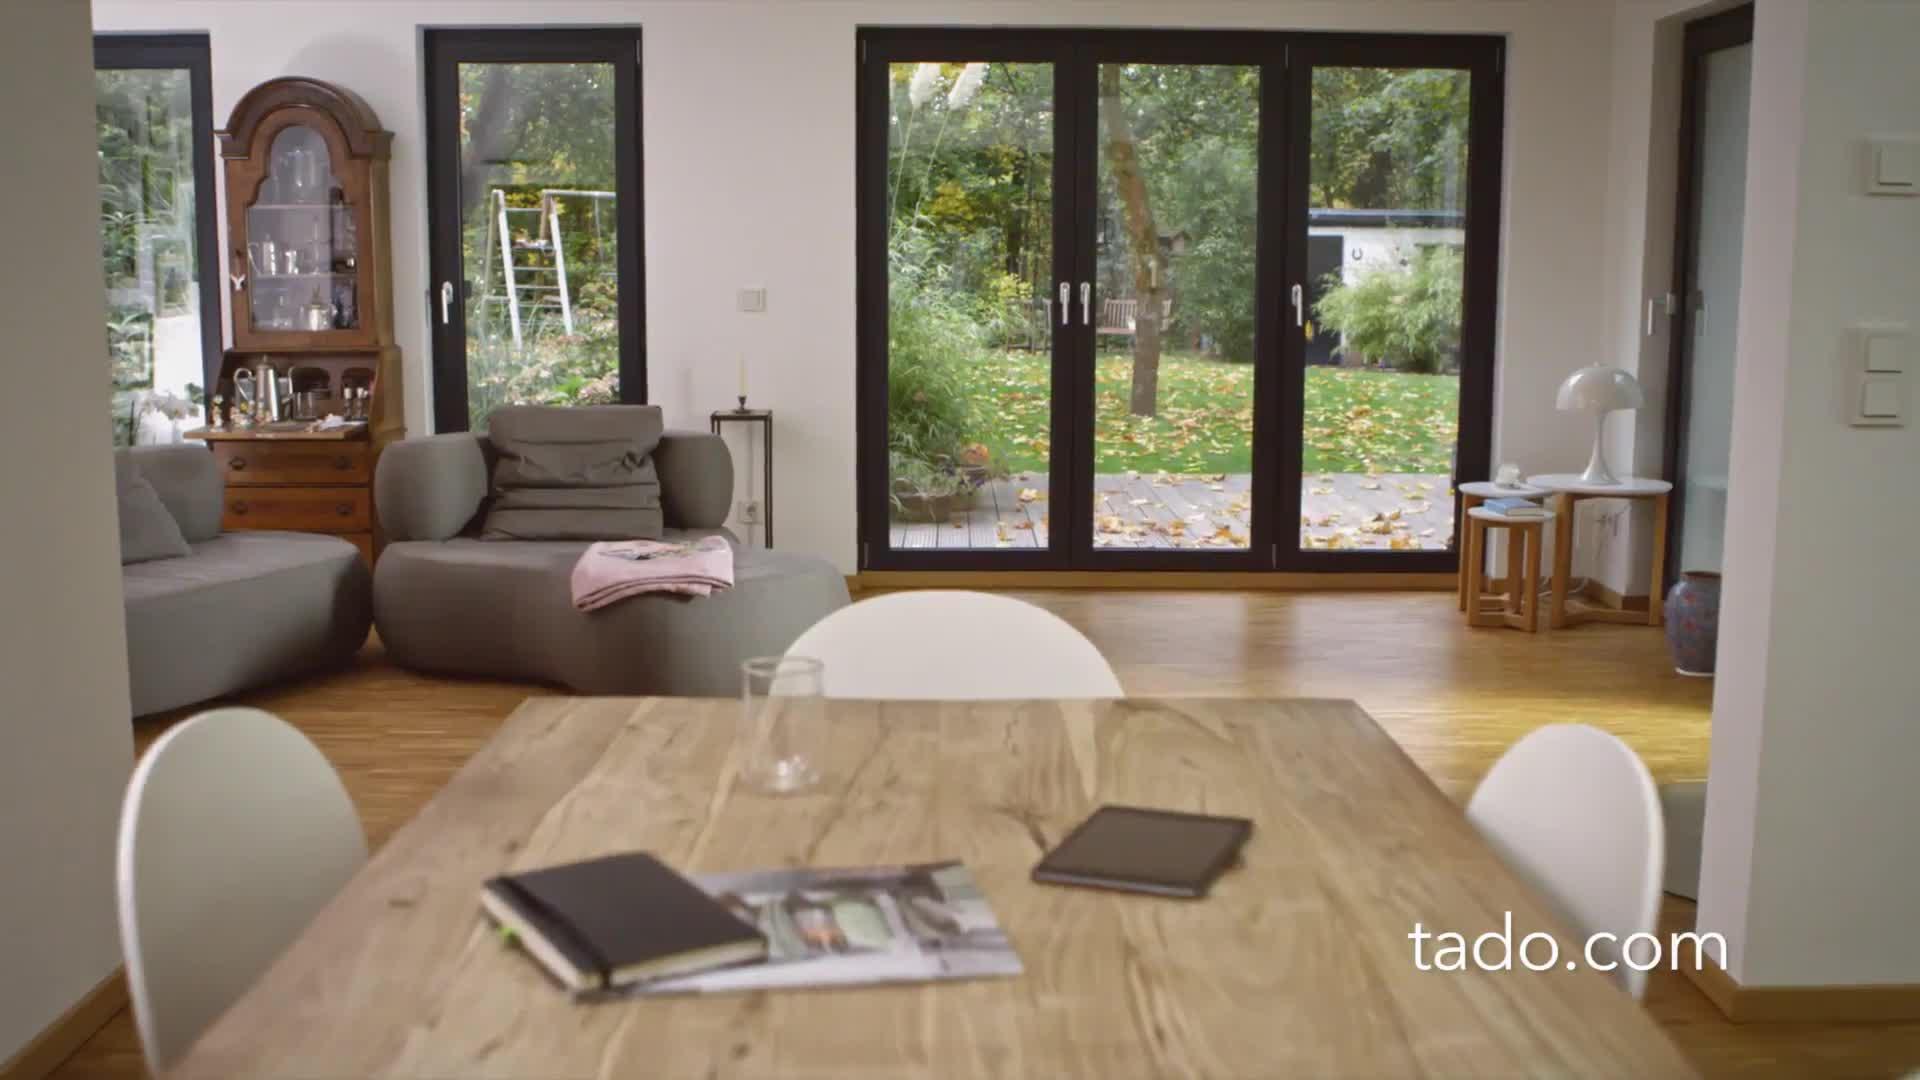 Tado Extension Kit Littlewoods